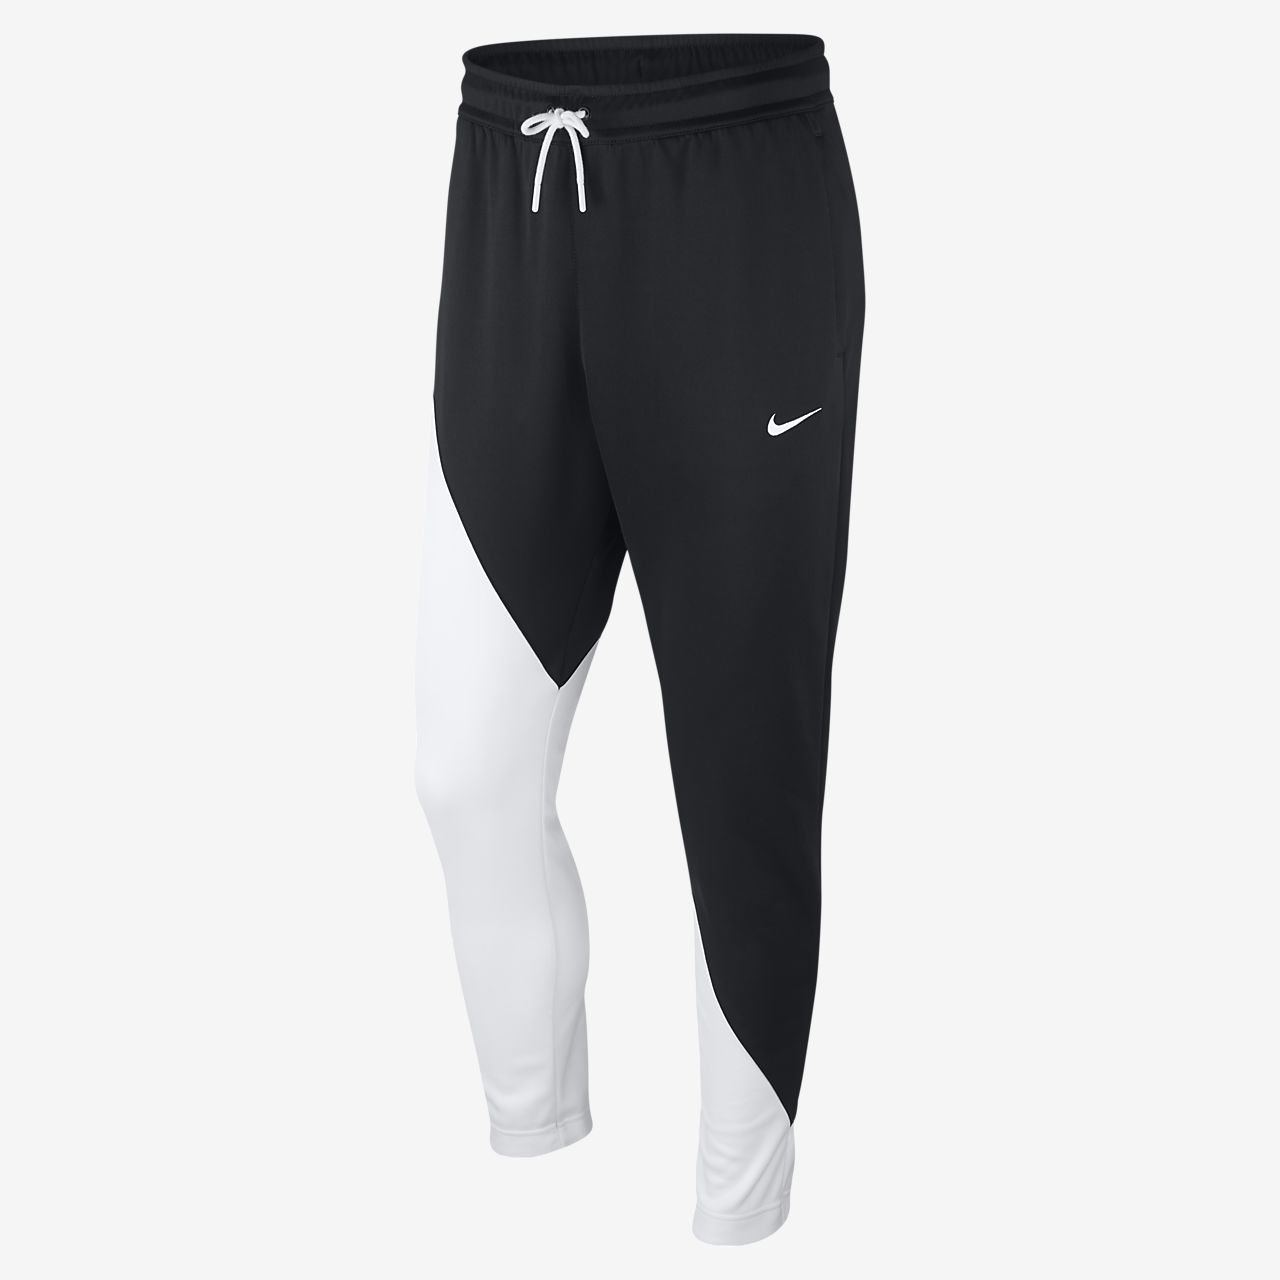 Pánské kalhoty Nike Sportswear s logem Swoosh